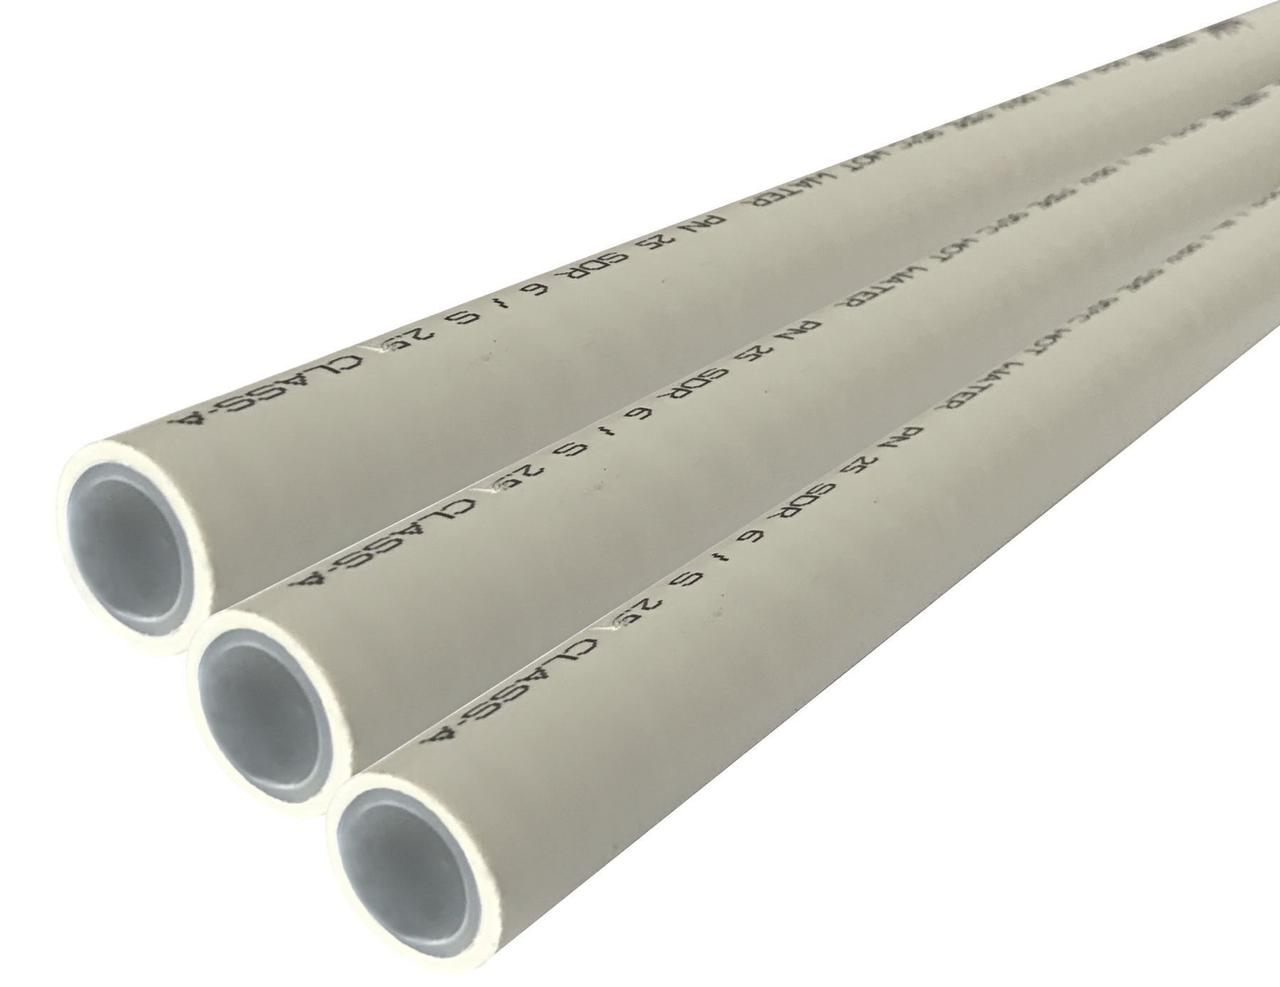 Труба поліпропіленова з алюмінієвою фольгою Kalde Super Pipe PPR 75 мм PN 25